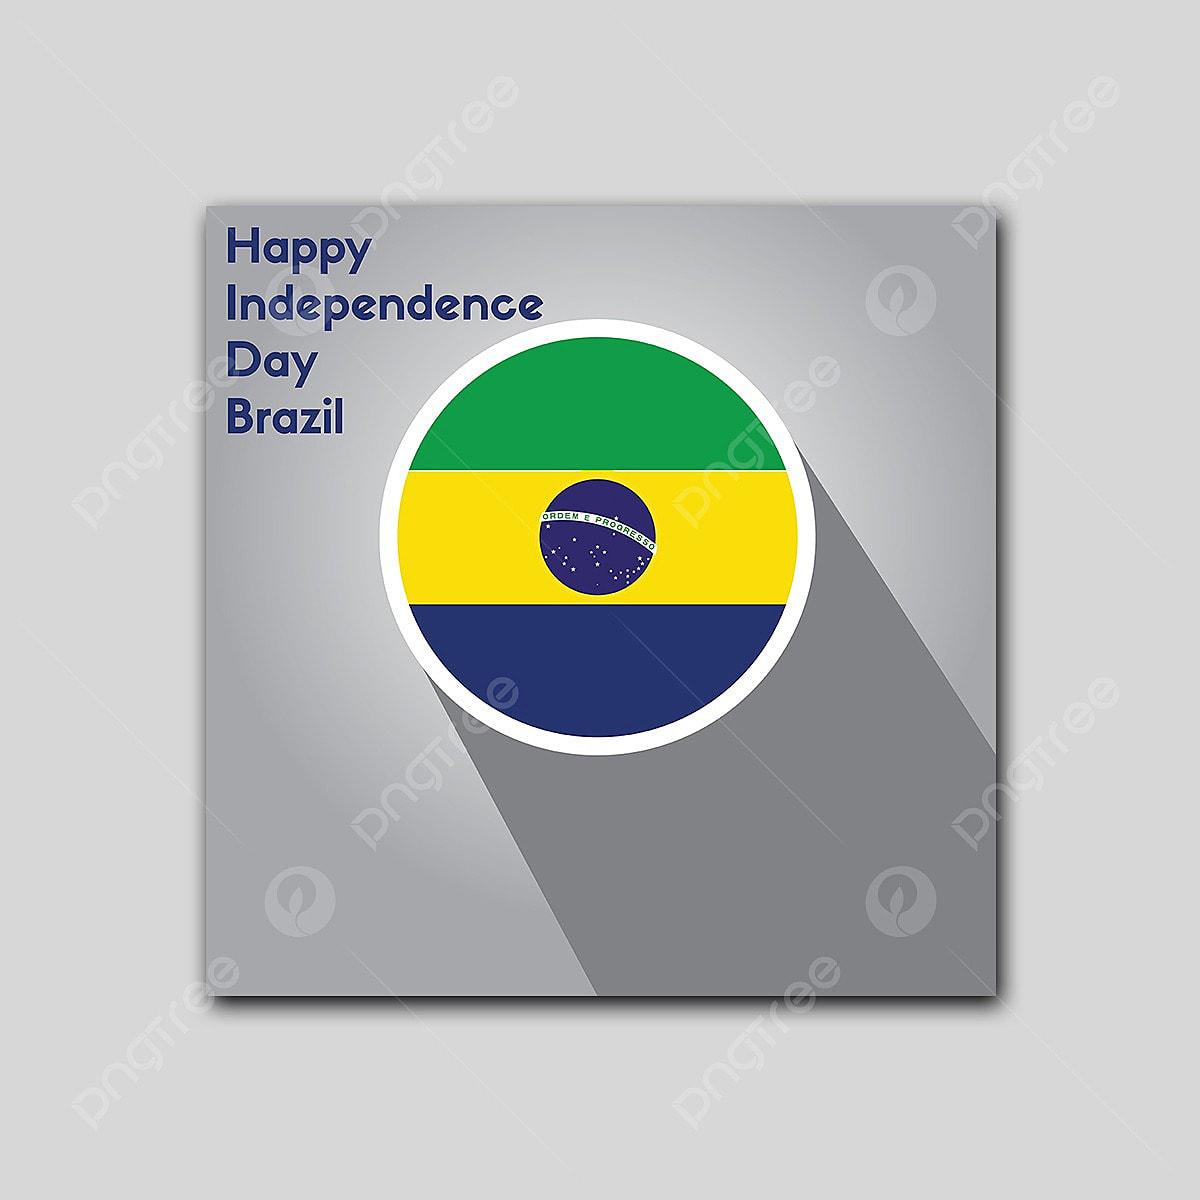 Brazil Hari Kemerdekaan 3 Brazil Hari Kemerdekaan Brazil Hari